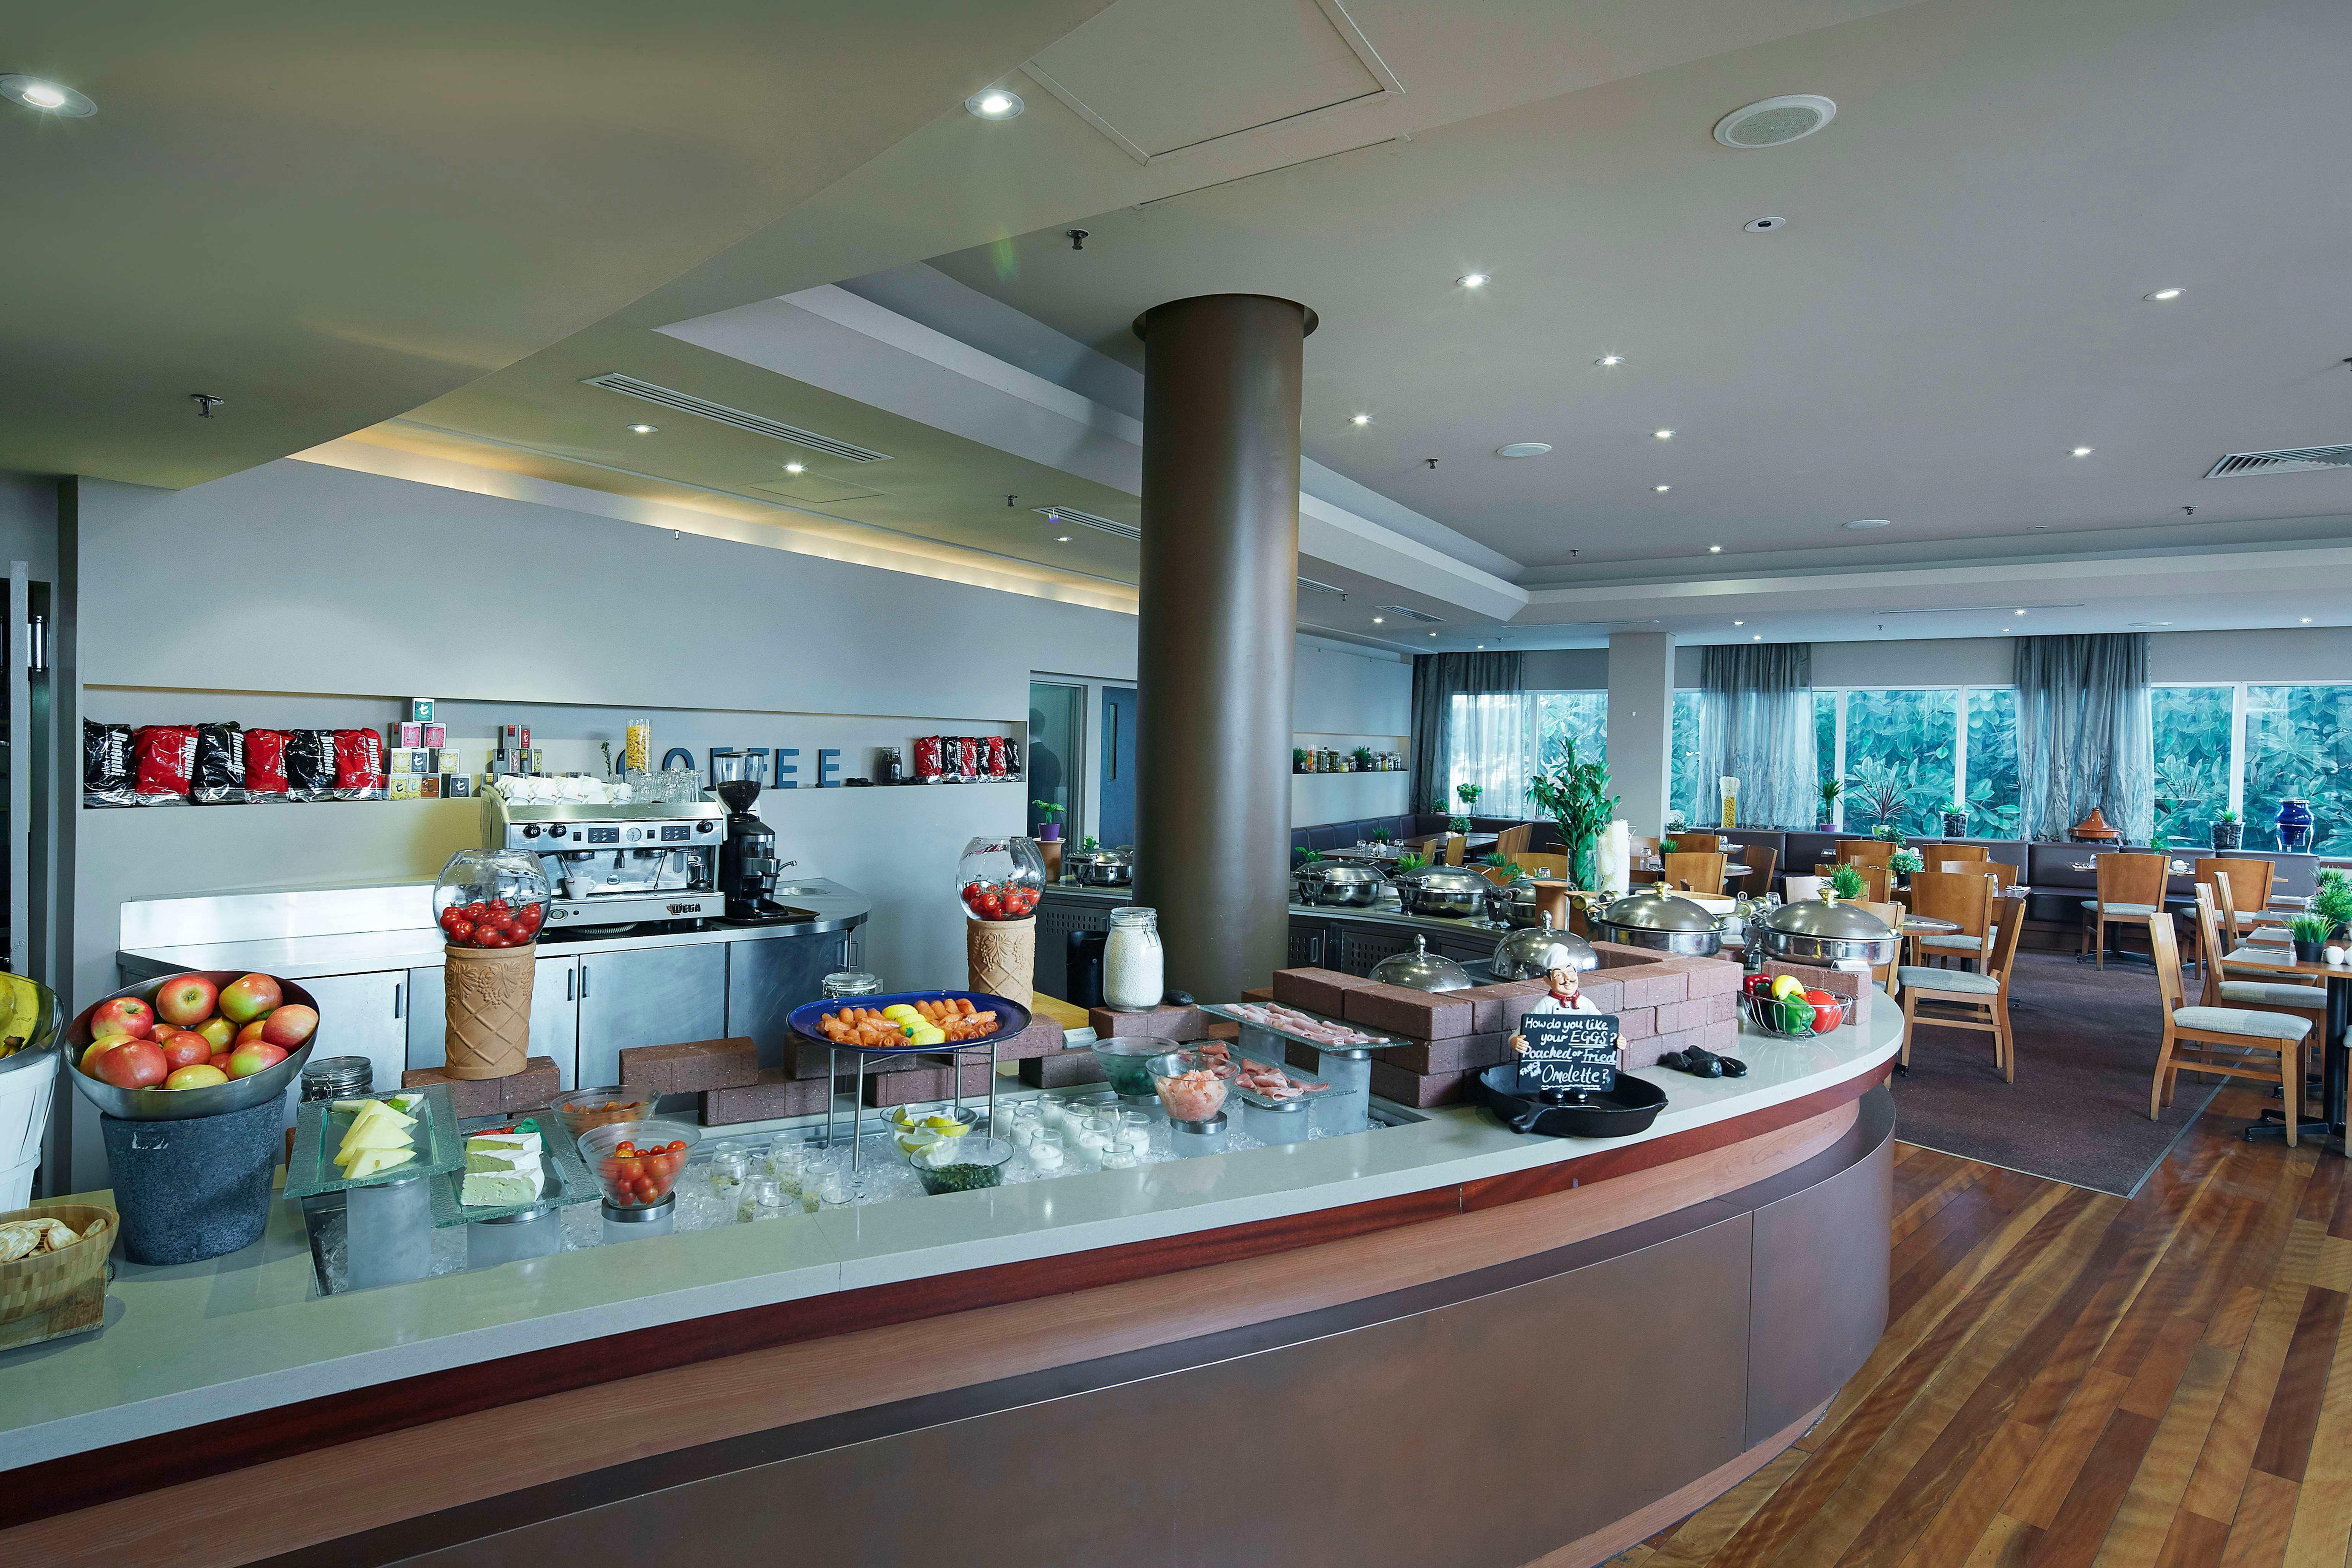 Perth Novotel Langley breakfast